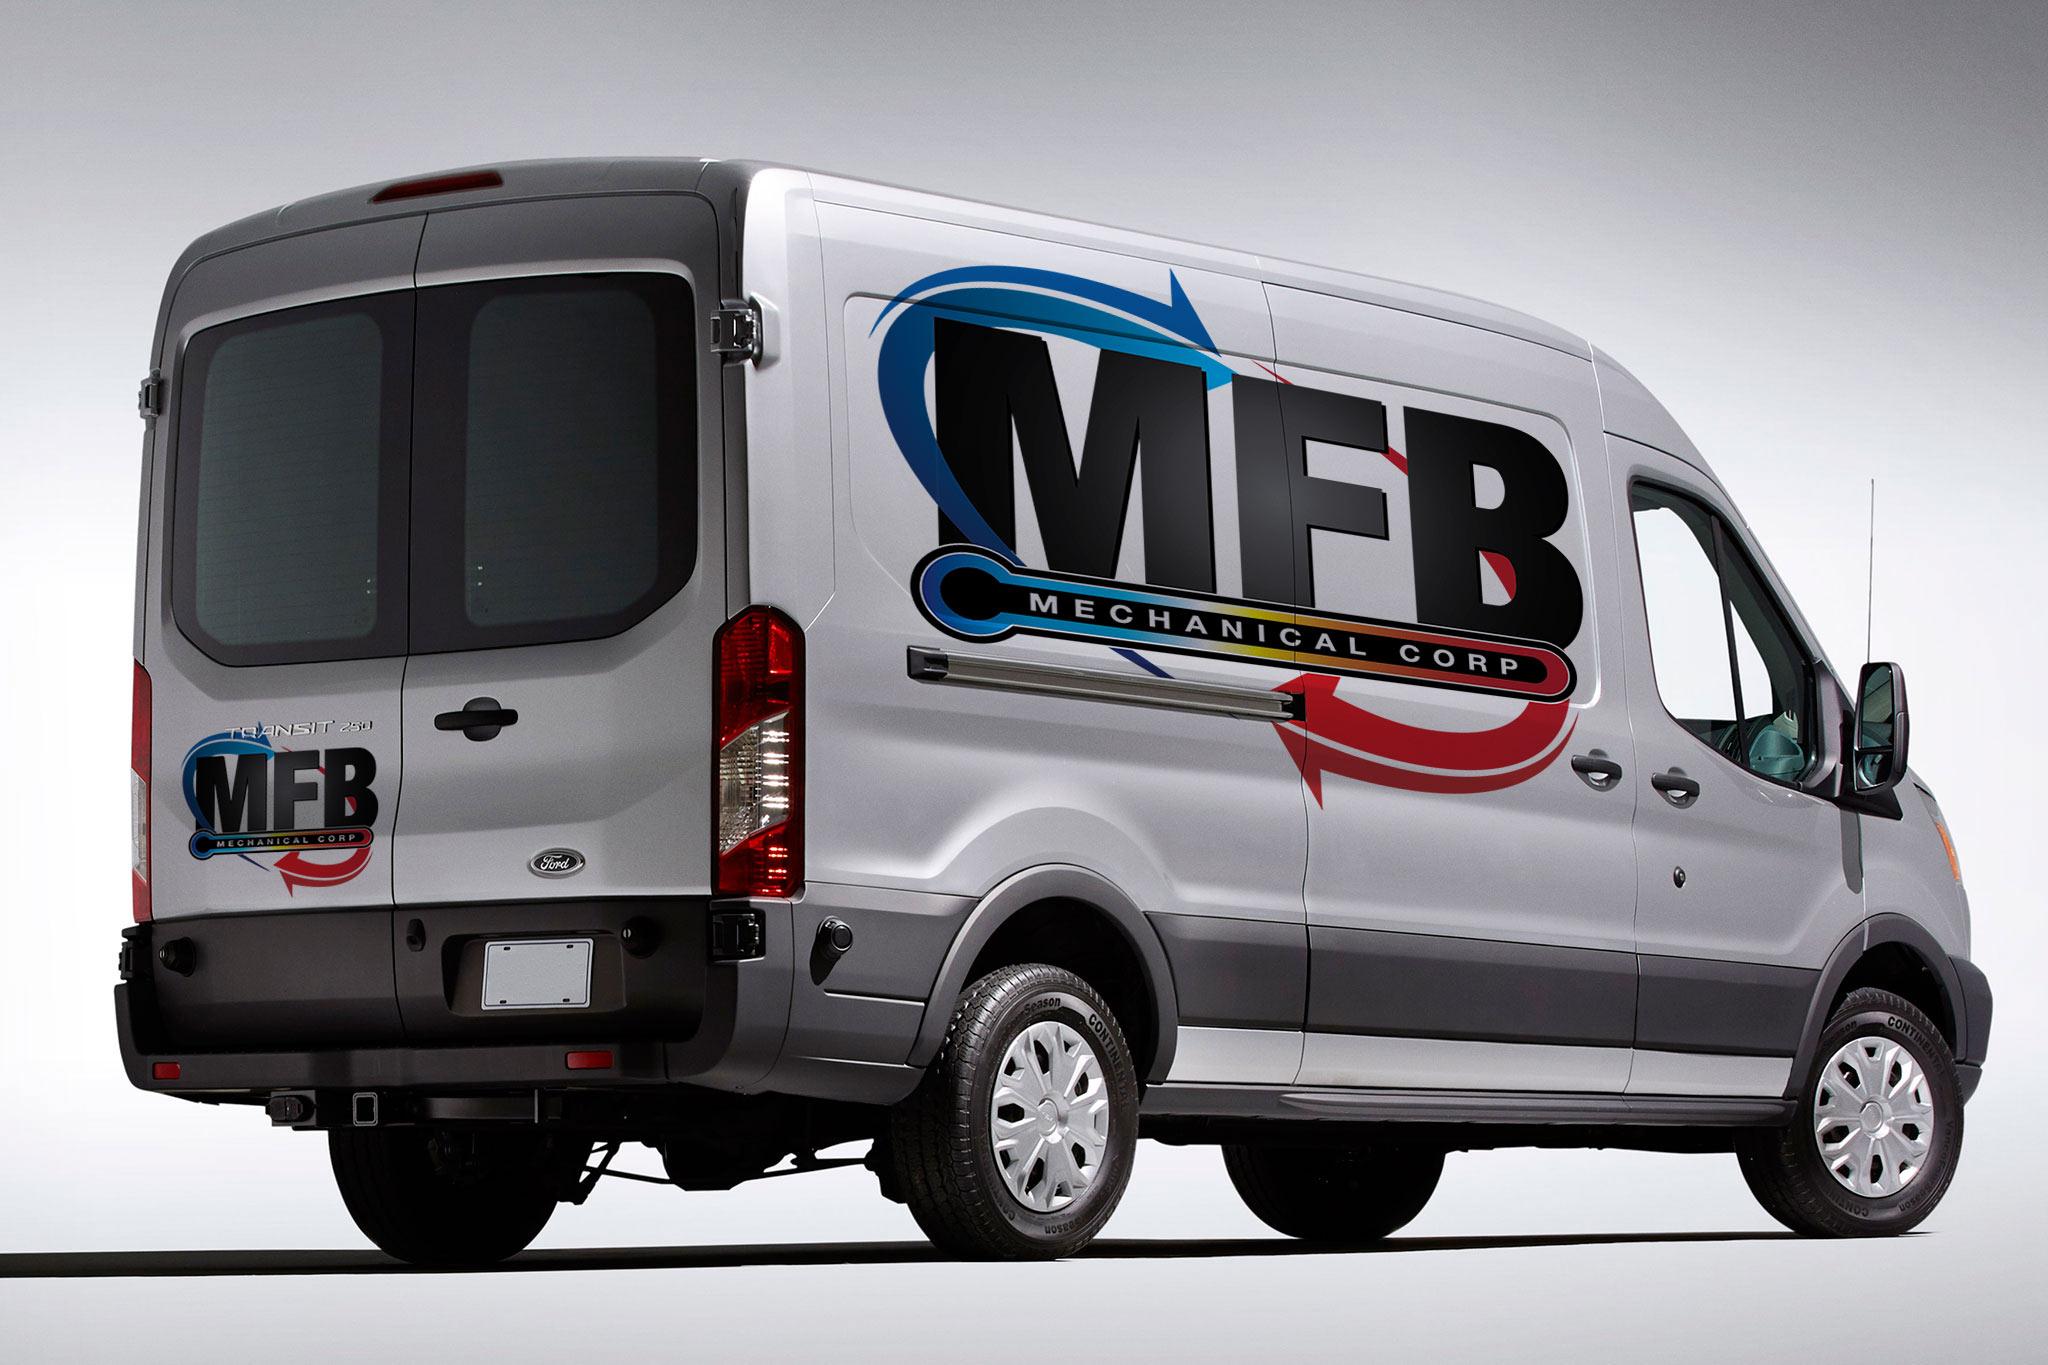 MFB Mechanical Corp Van Mockup.